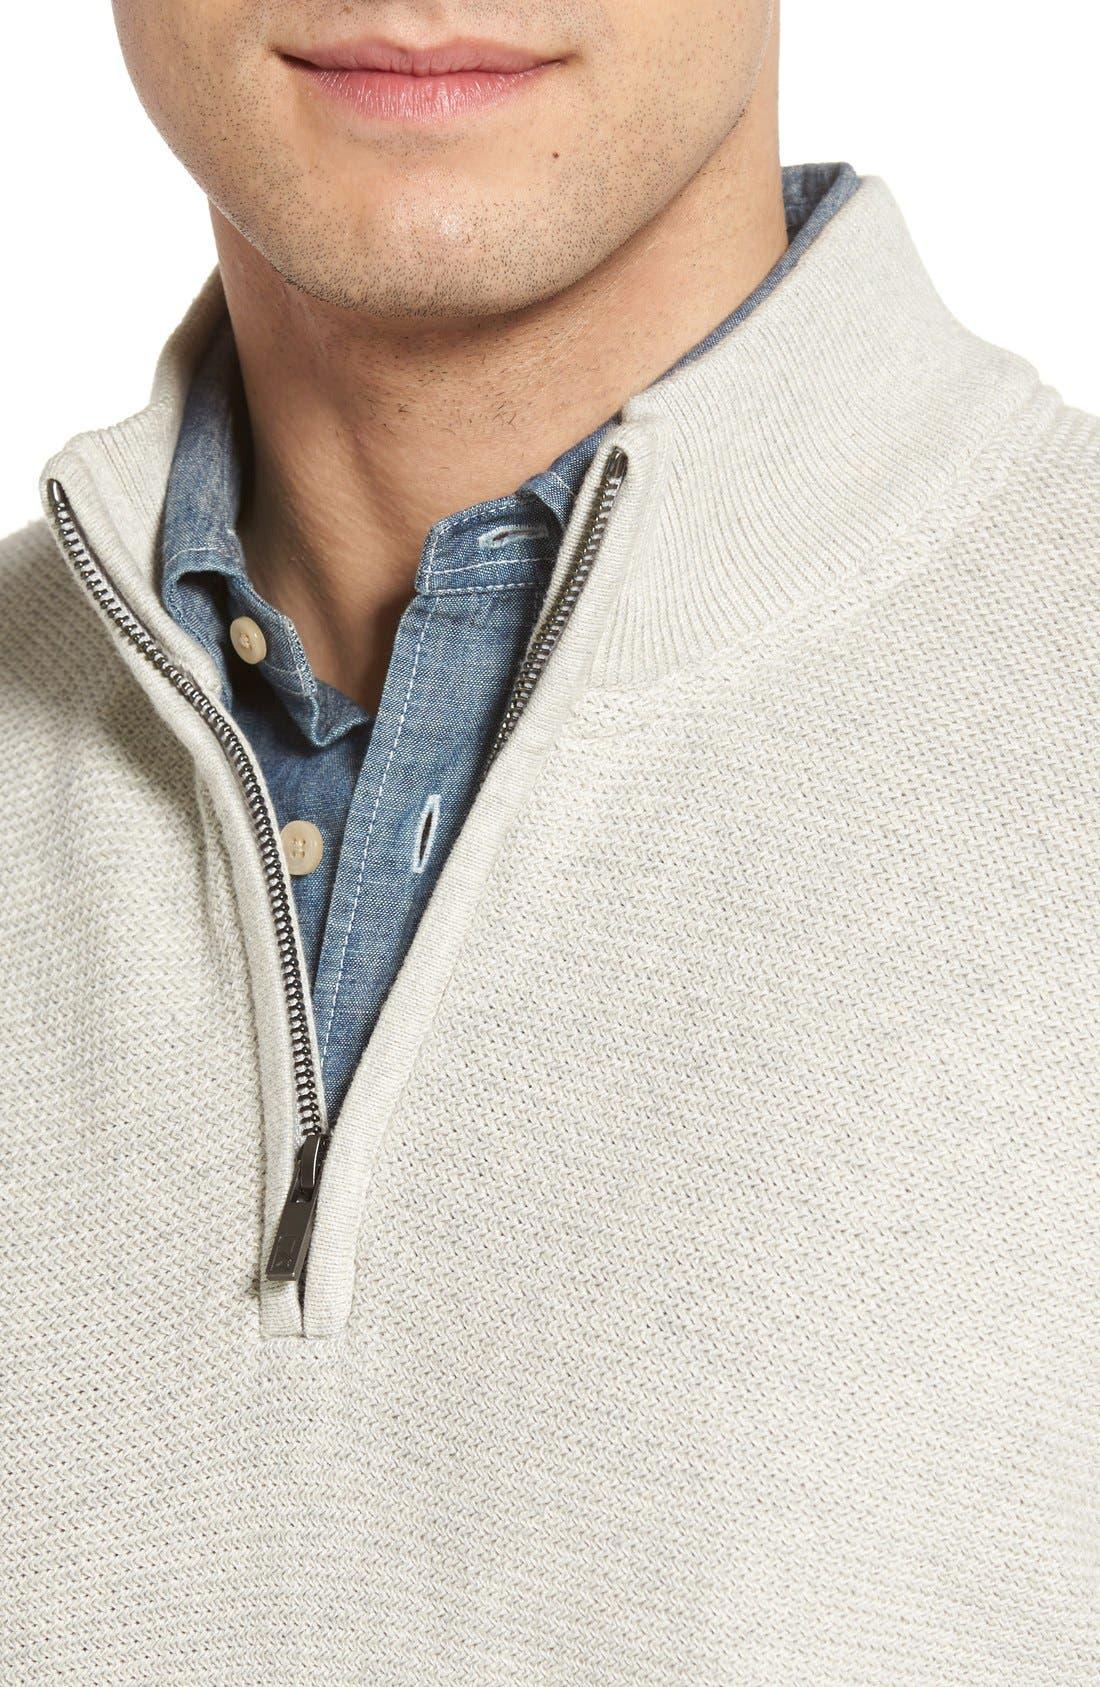 'Benson' Quarter Zip Textured Knit Sweater,                             Alternate thumbnail 4, color,                             Limestone Heather